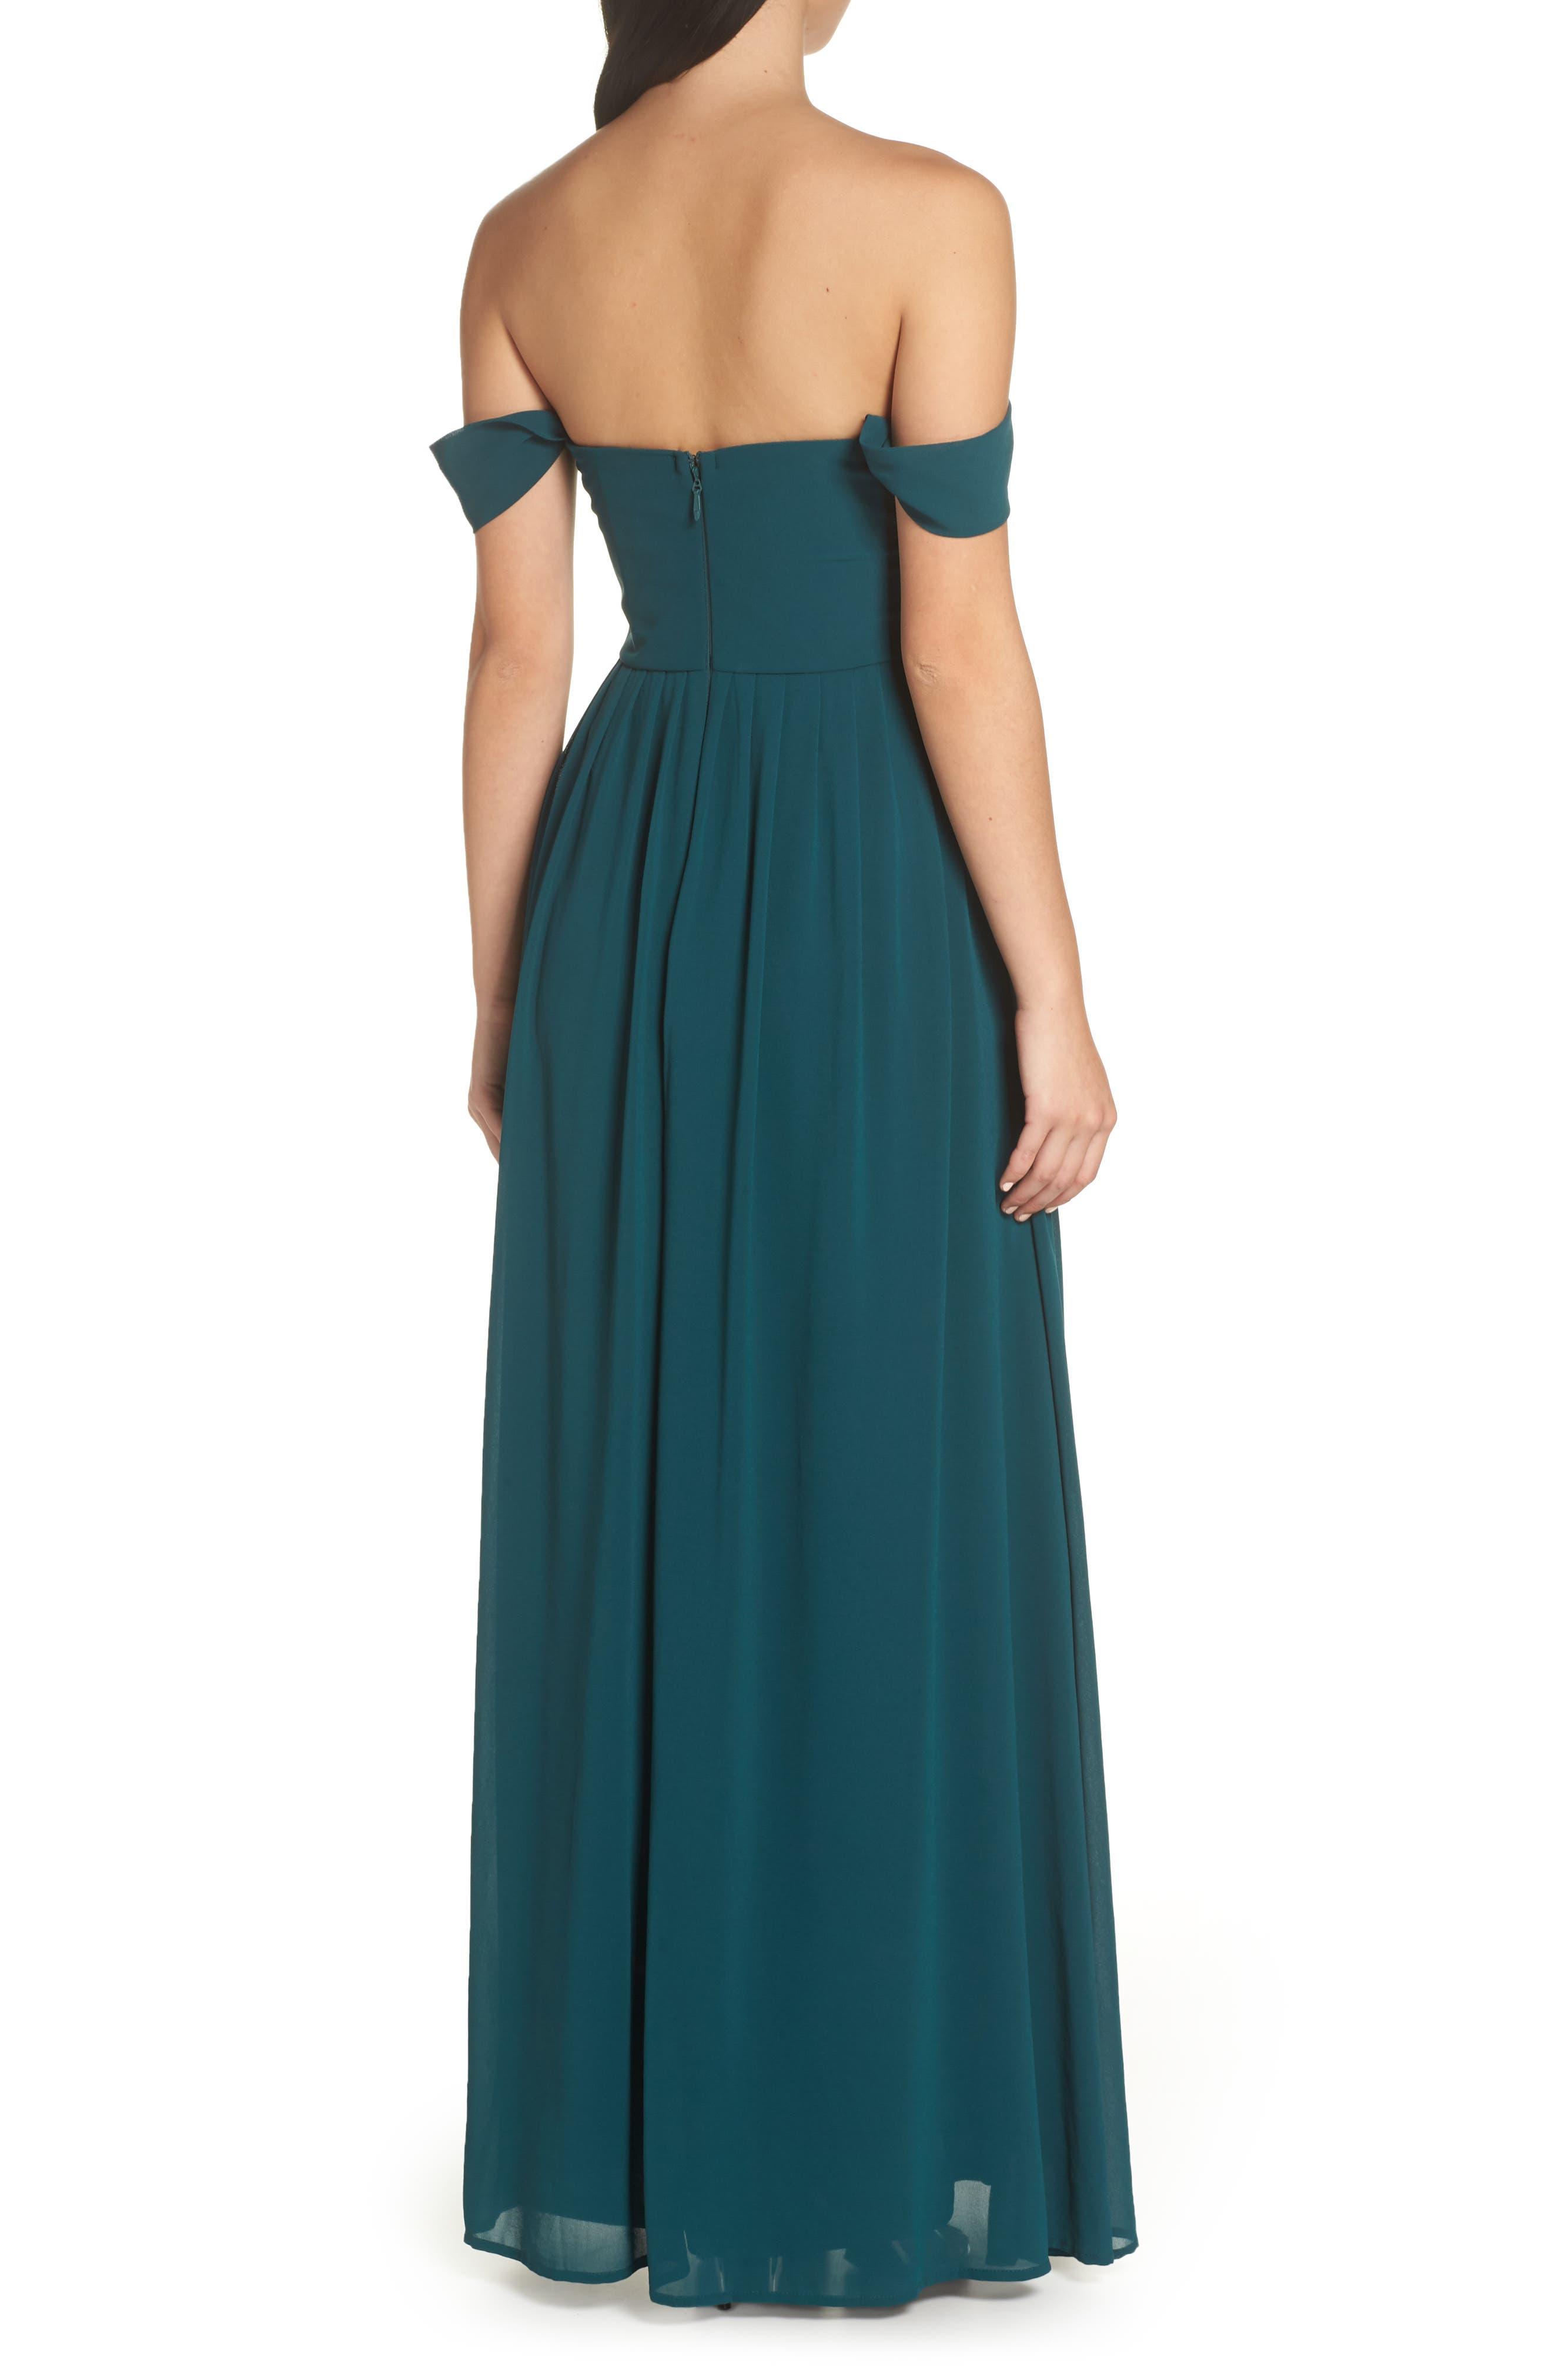 LULUS, Convertible Neckline Chiffon Gown, Alternate thumbnail 2, color, DEEP EMERALD